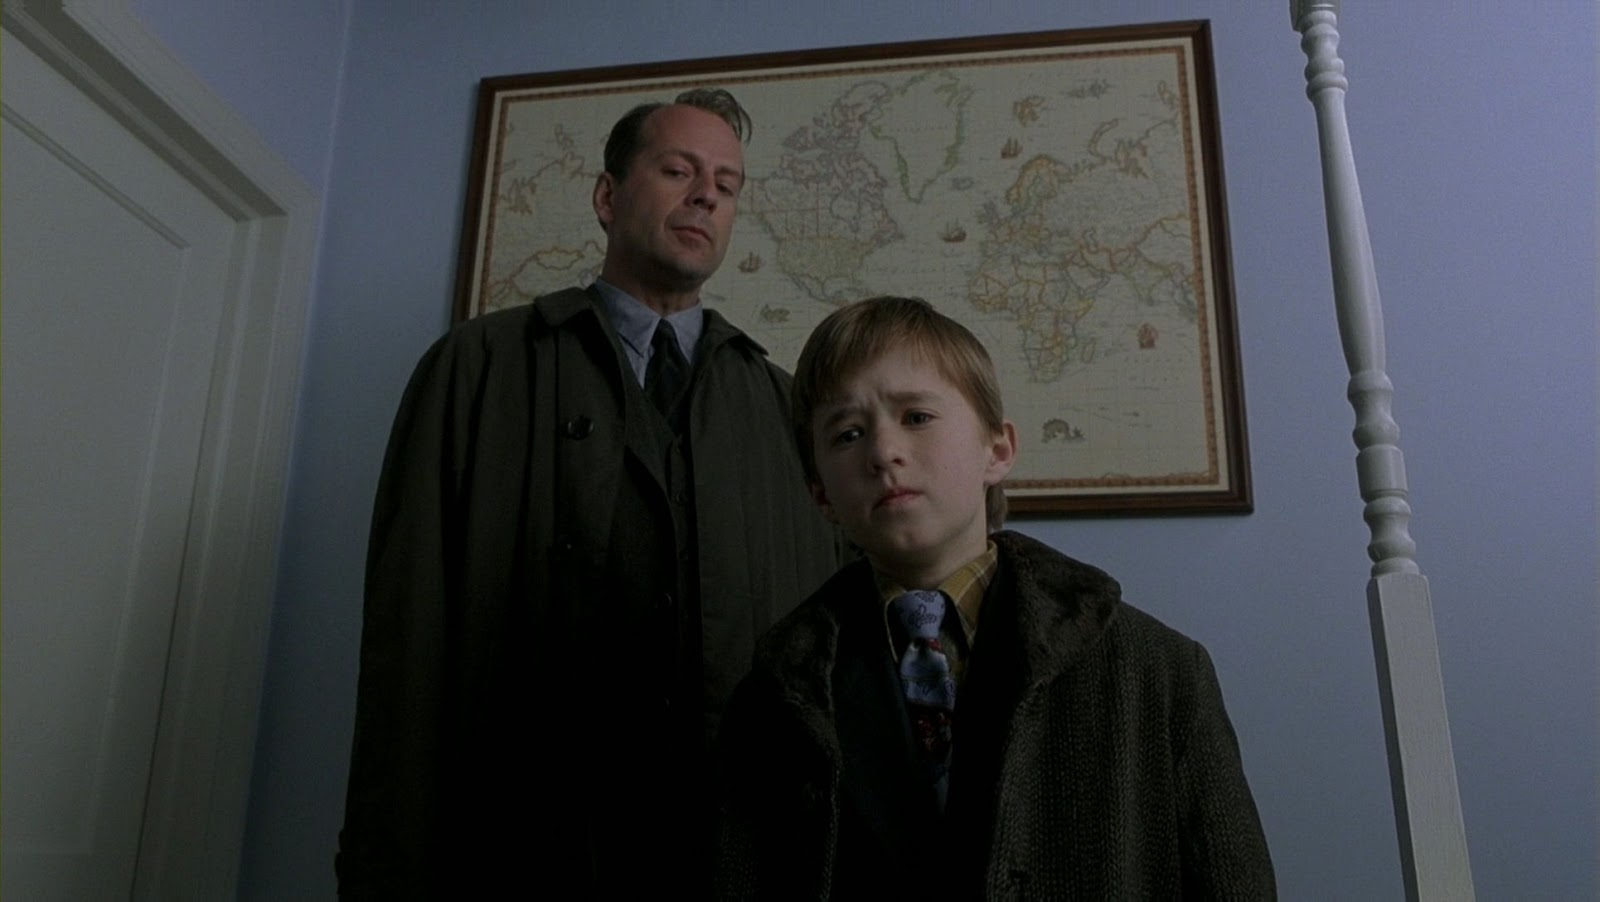 The Ace Black Movie Blog Movie Review The Sixth Sense 1999